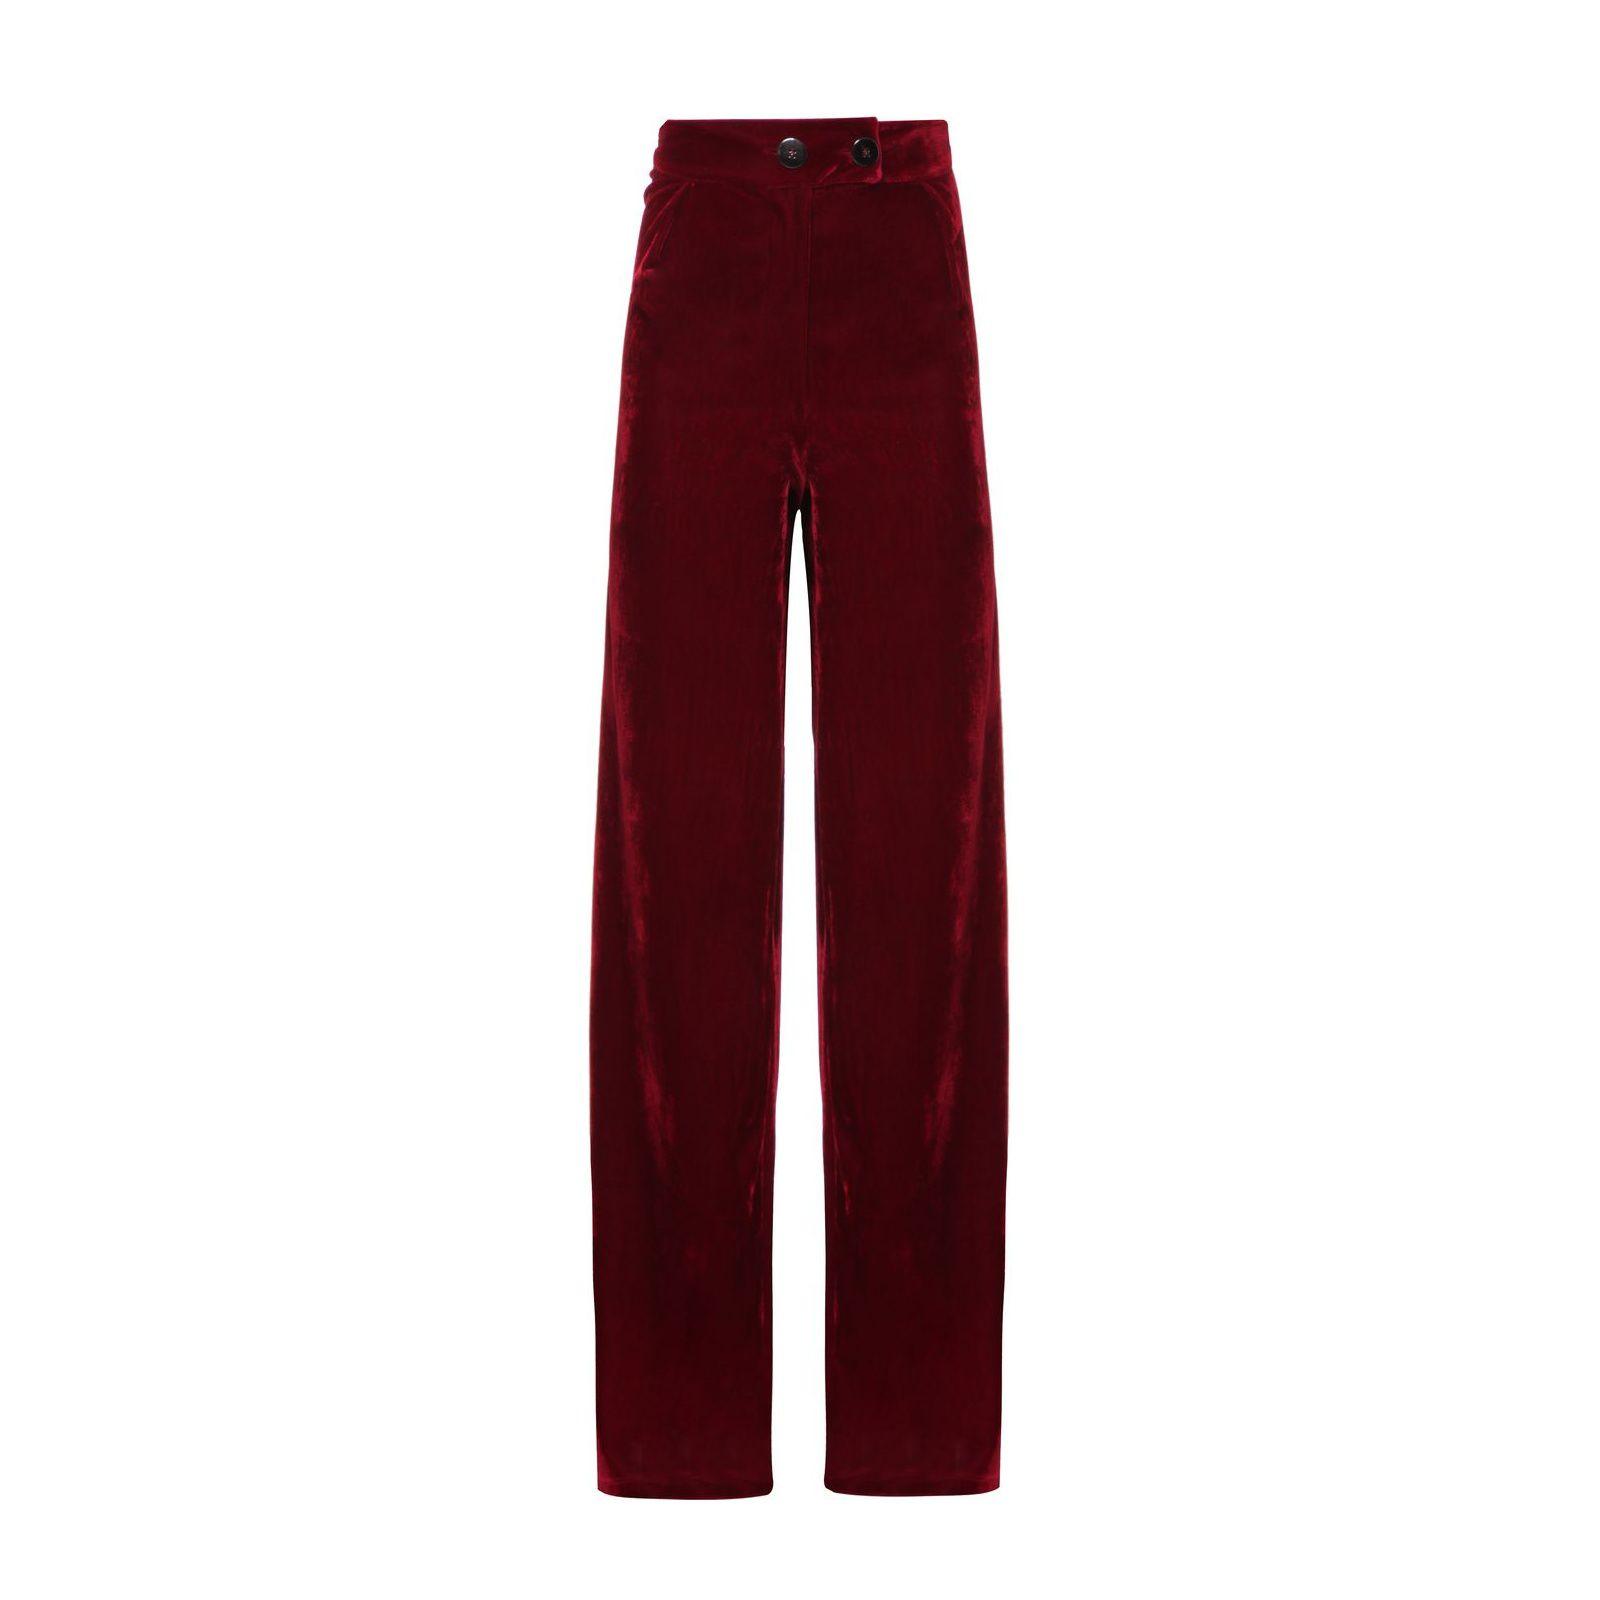 Calça Pantalona Veludo Isabella Fiorentino - Vermelho